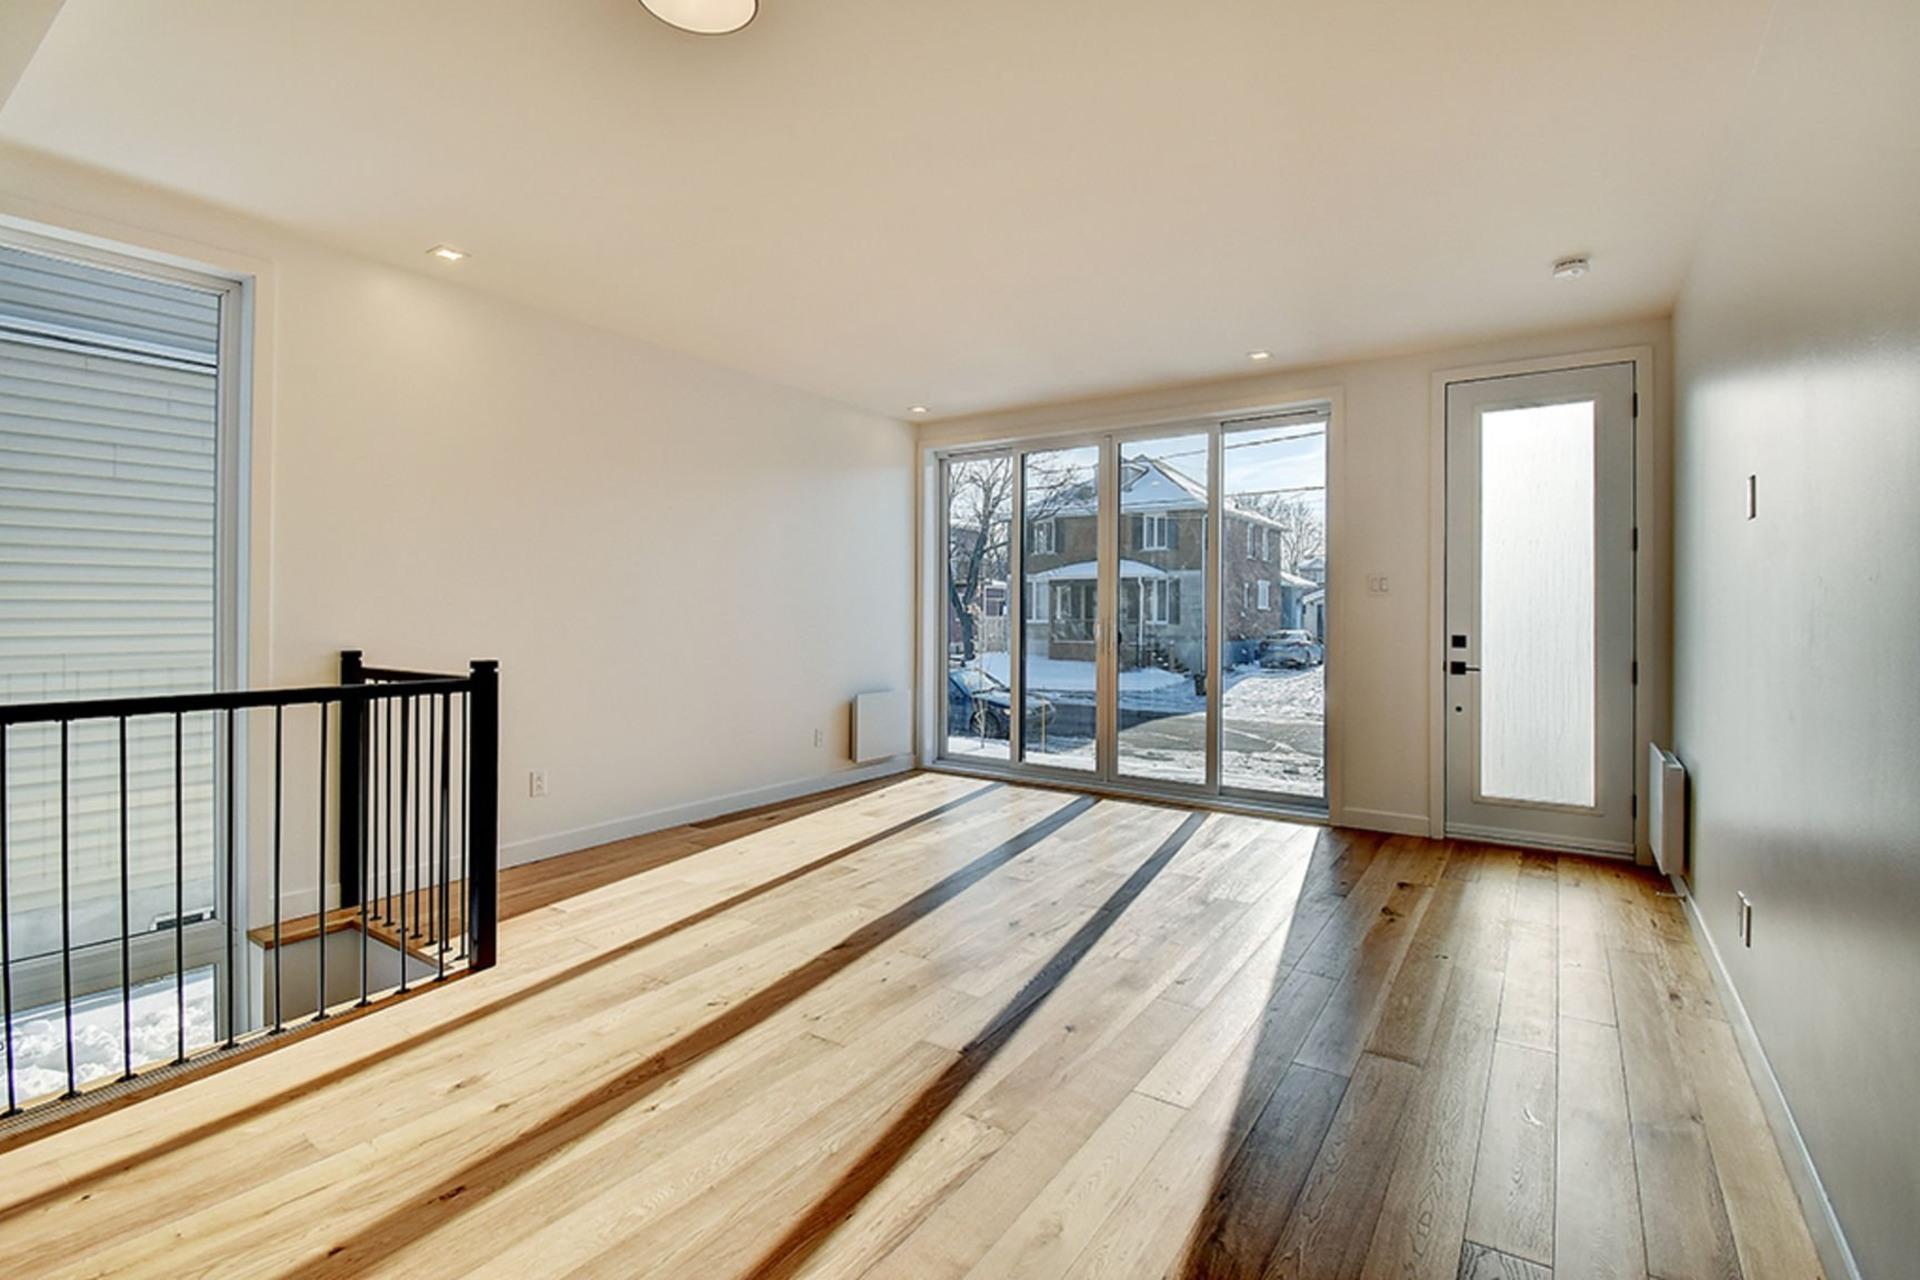 image 3 - Apartment For sale Le Vieux-Longueuil Longueuil  - 9 rooms